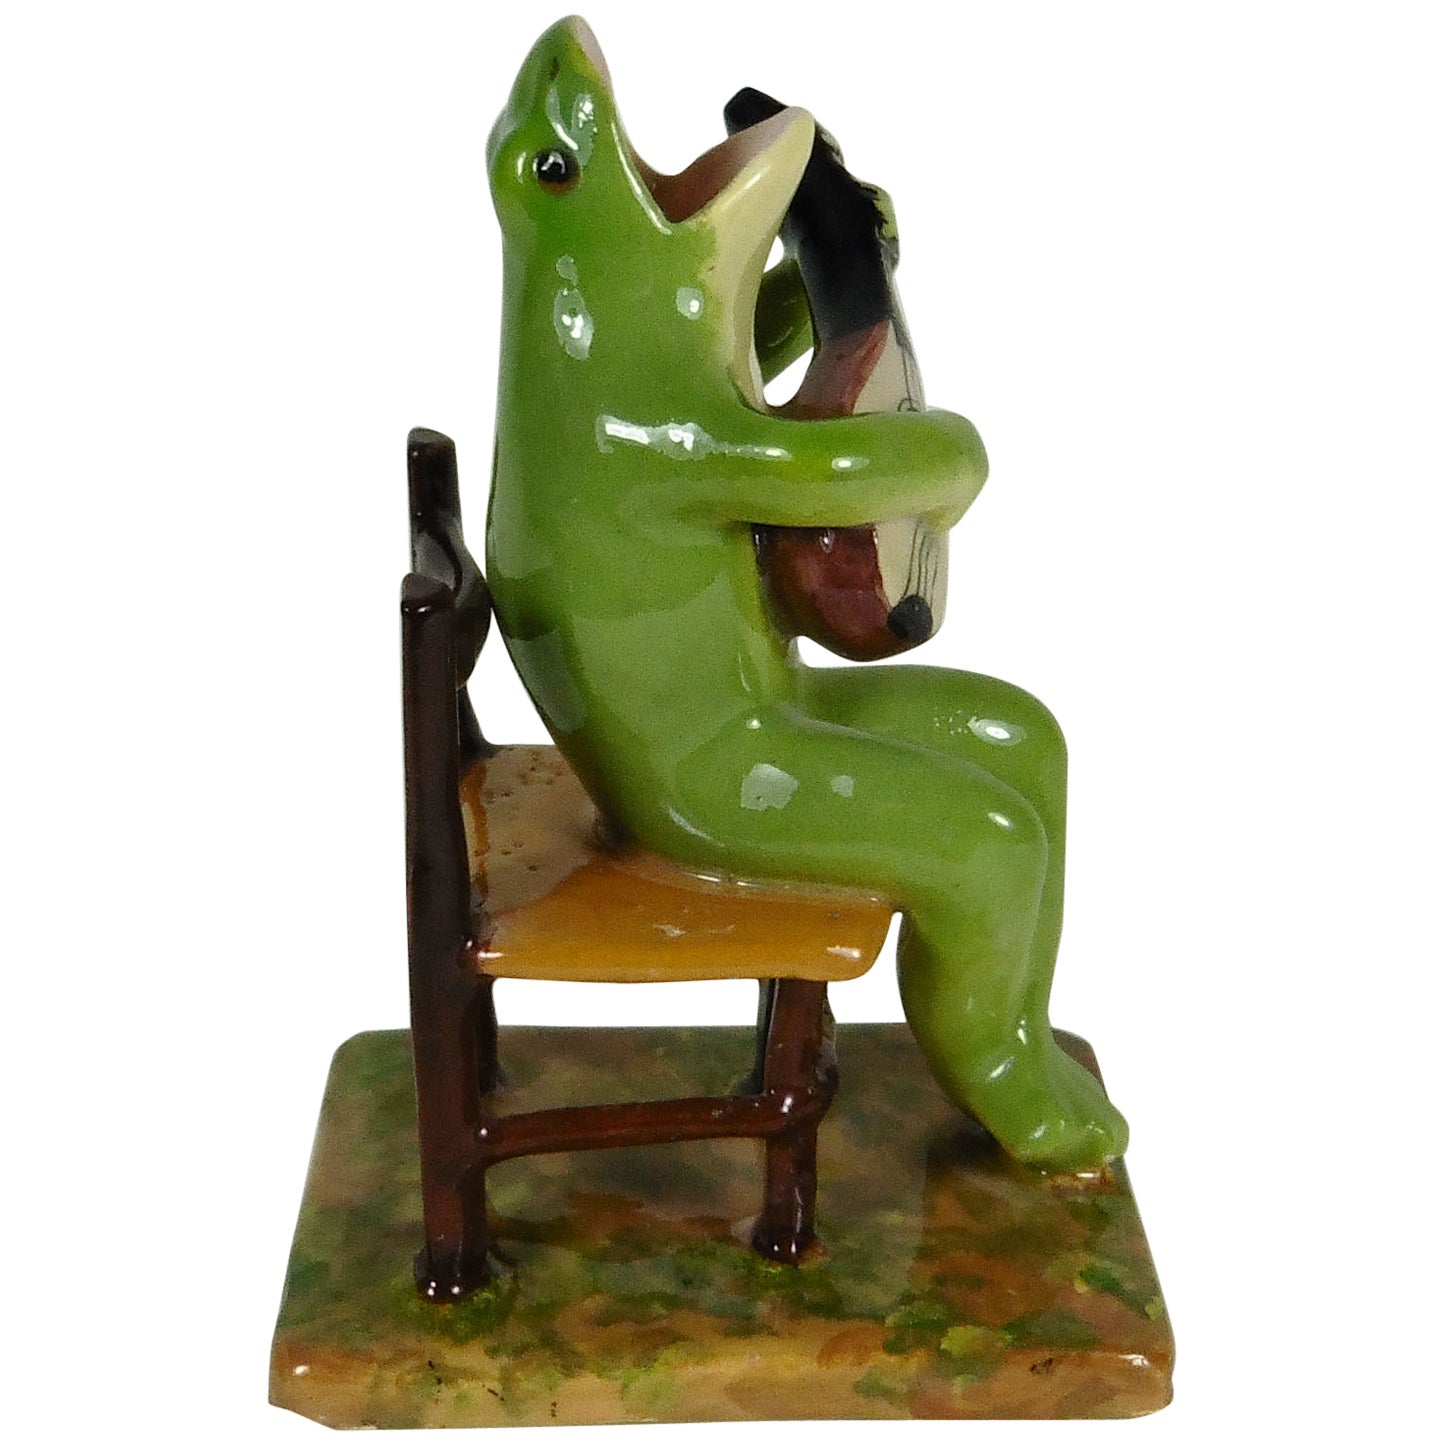 Rare Majolica Frog Sitting on a Chair Jerome Massier, circa 1910